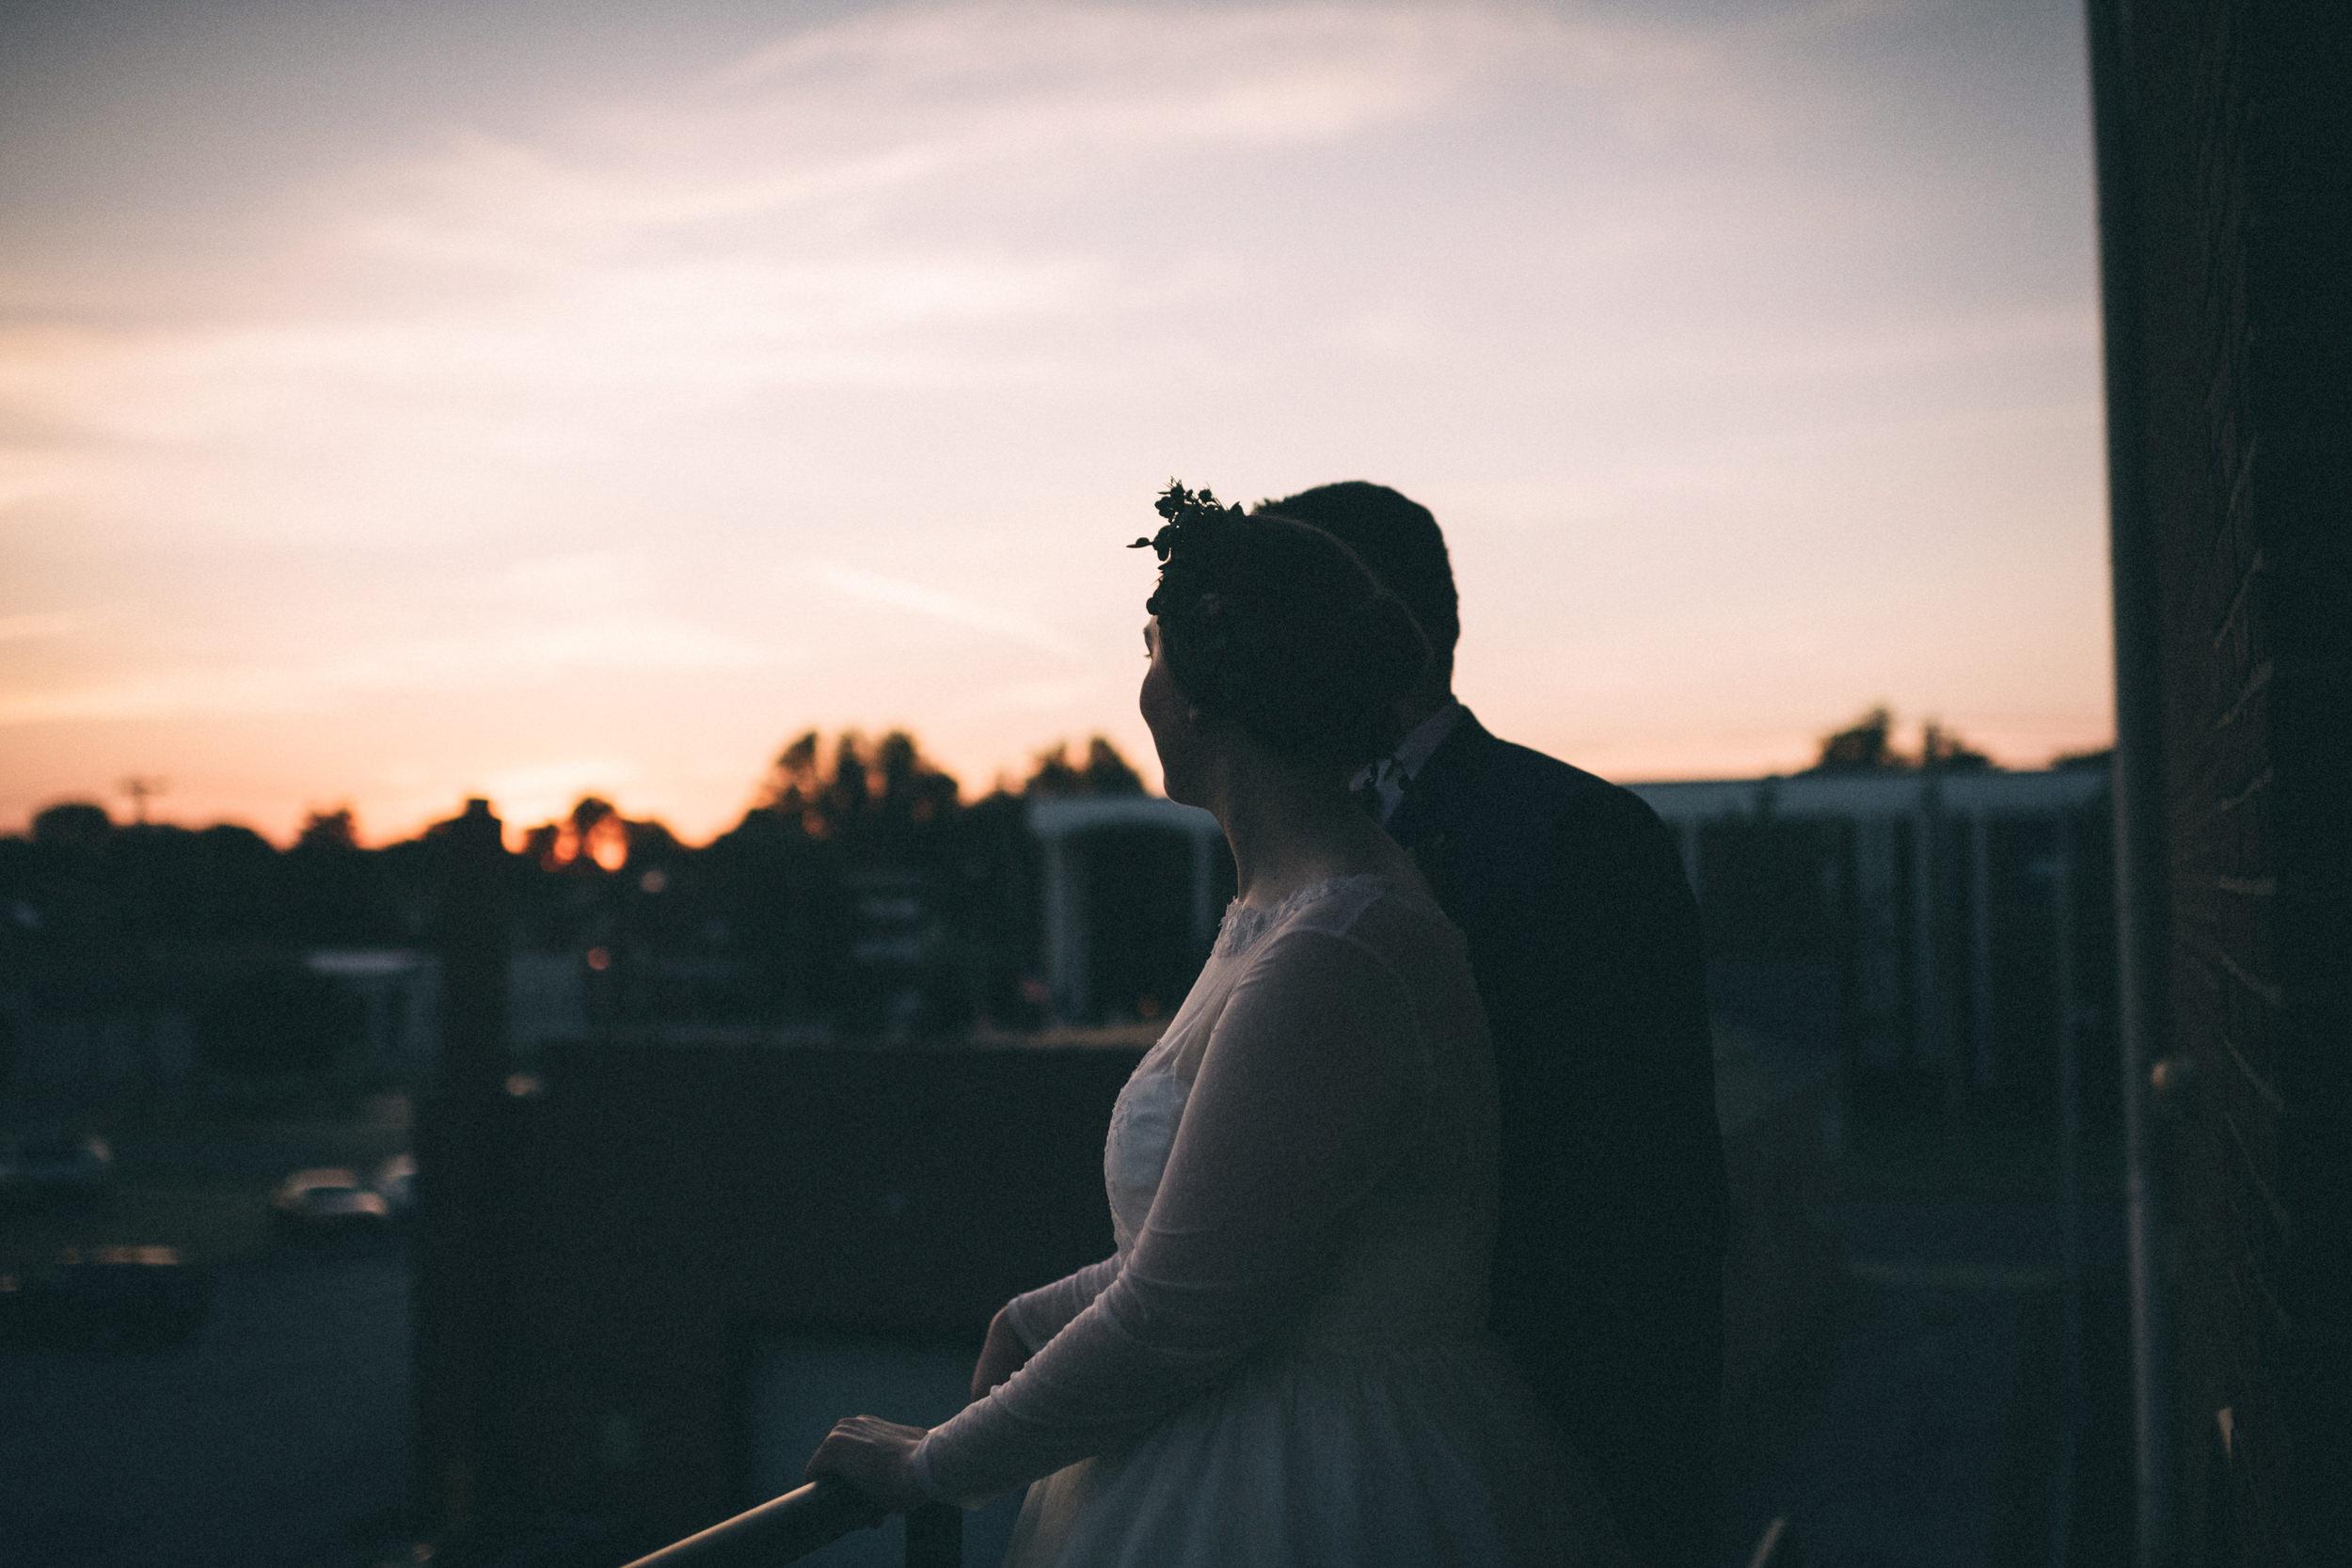 lauren-dean-wedding-grand-lodge-kentucky-sarah-katherine-davis-photography-653edit.jpg